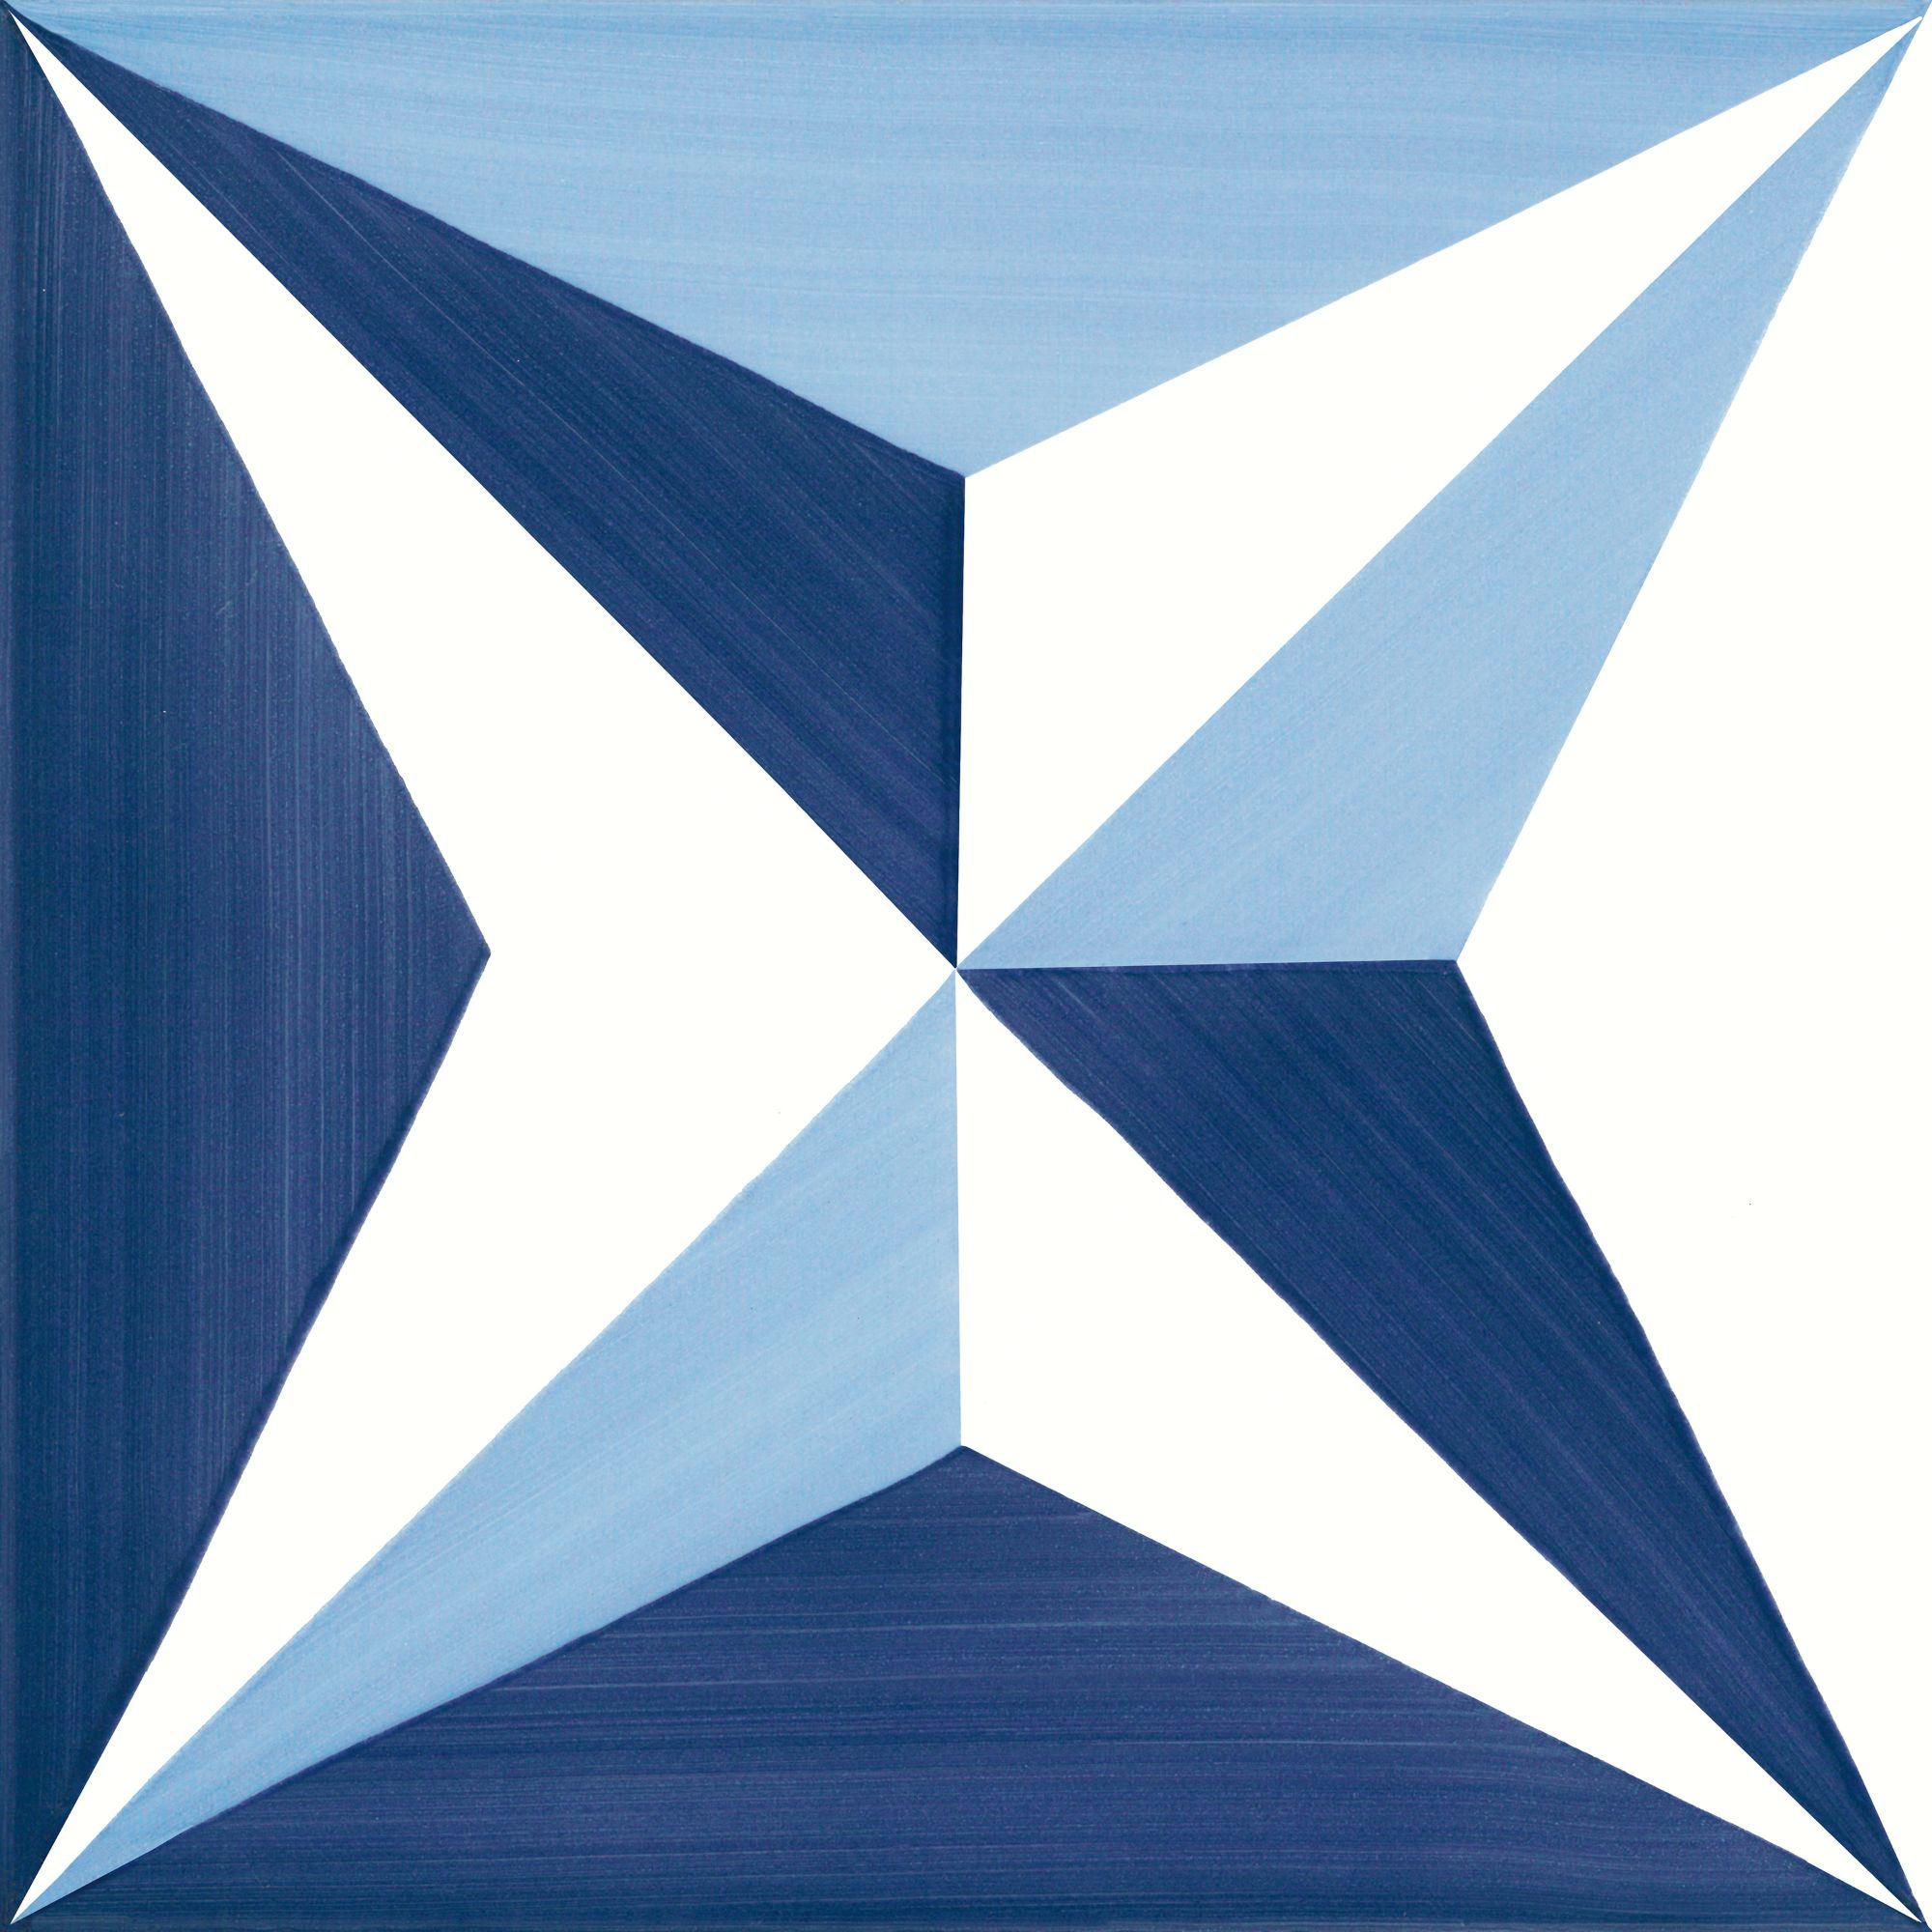 blu-ponti-decoro-tipo-10